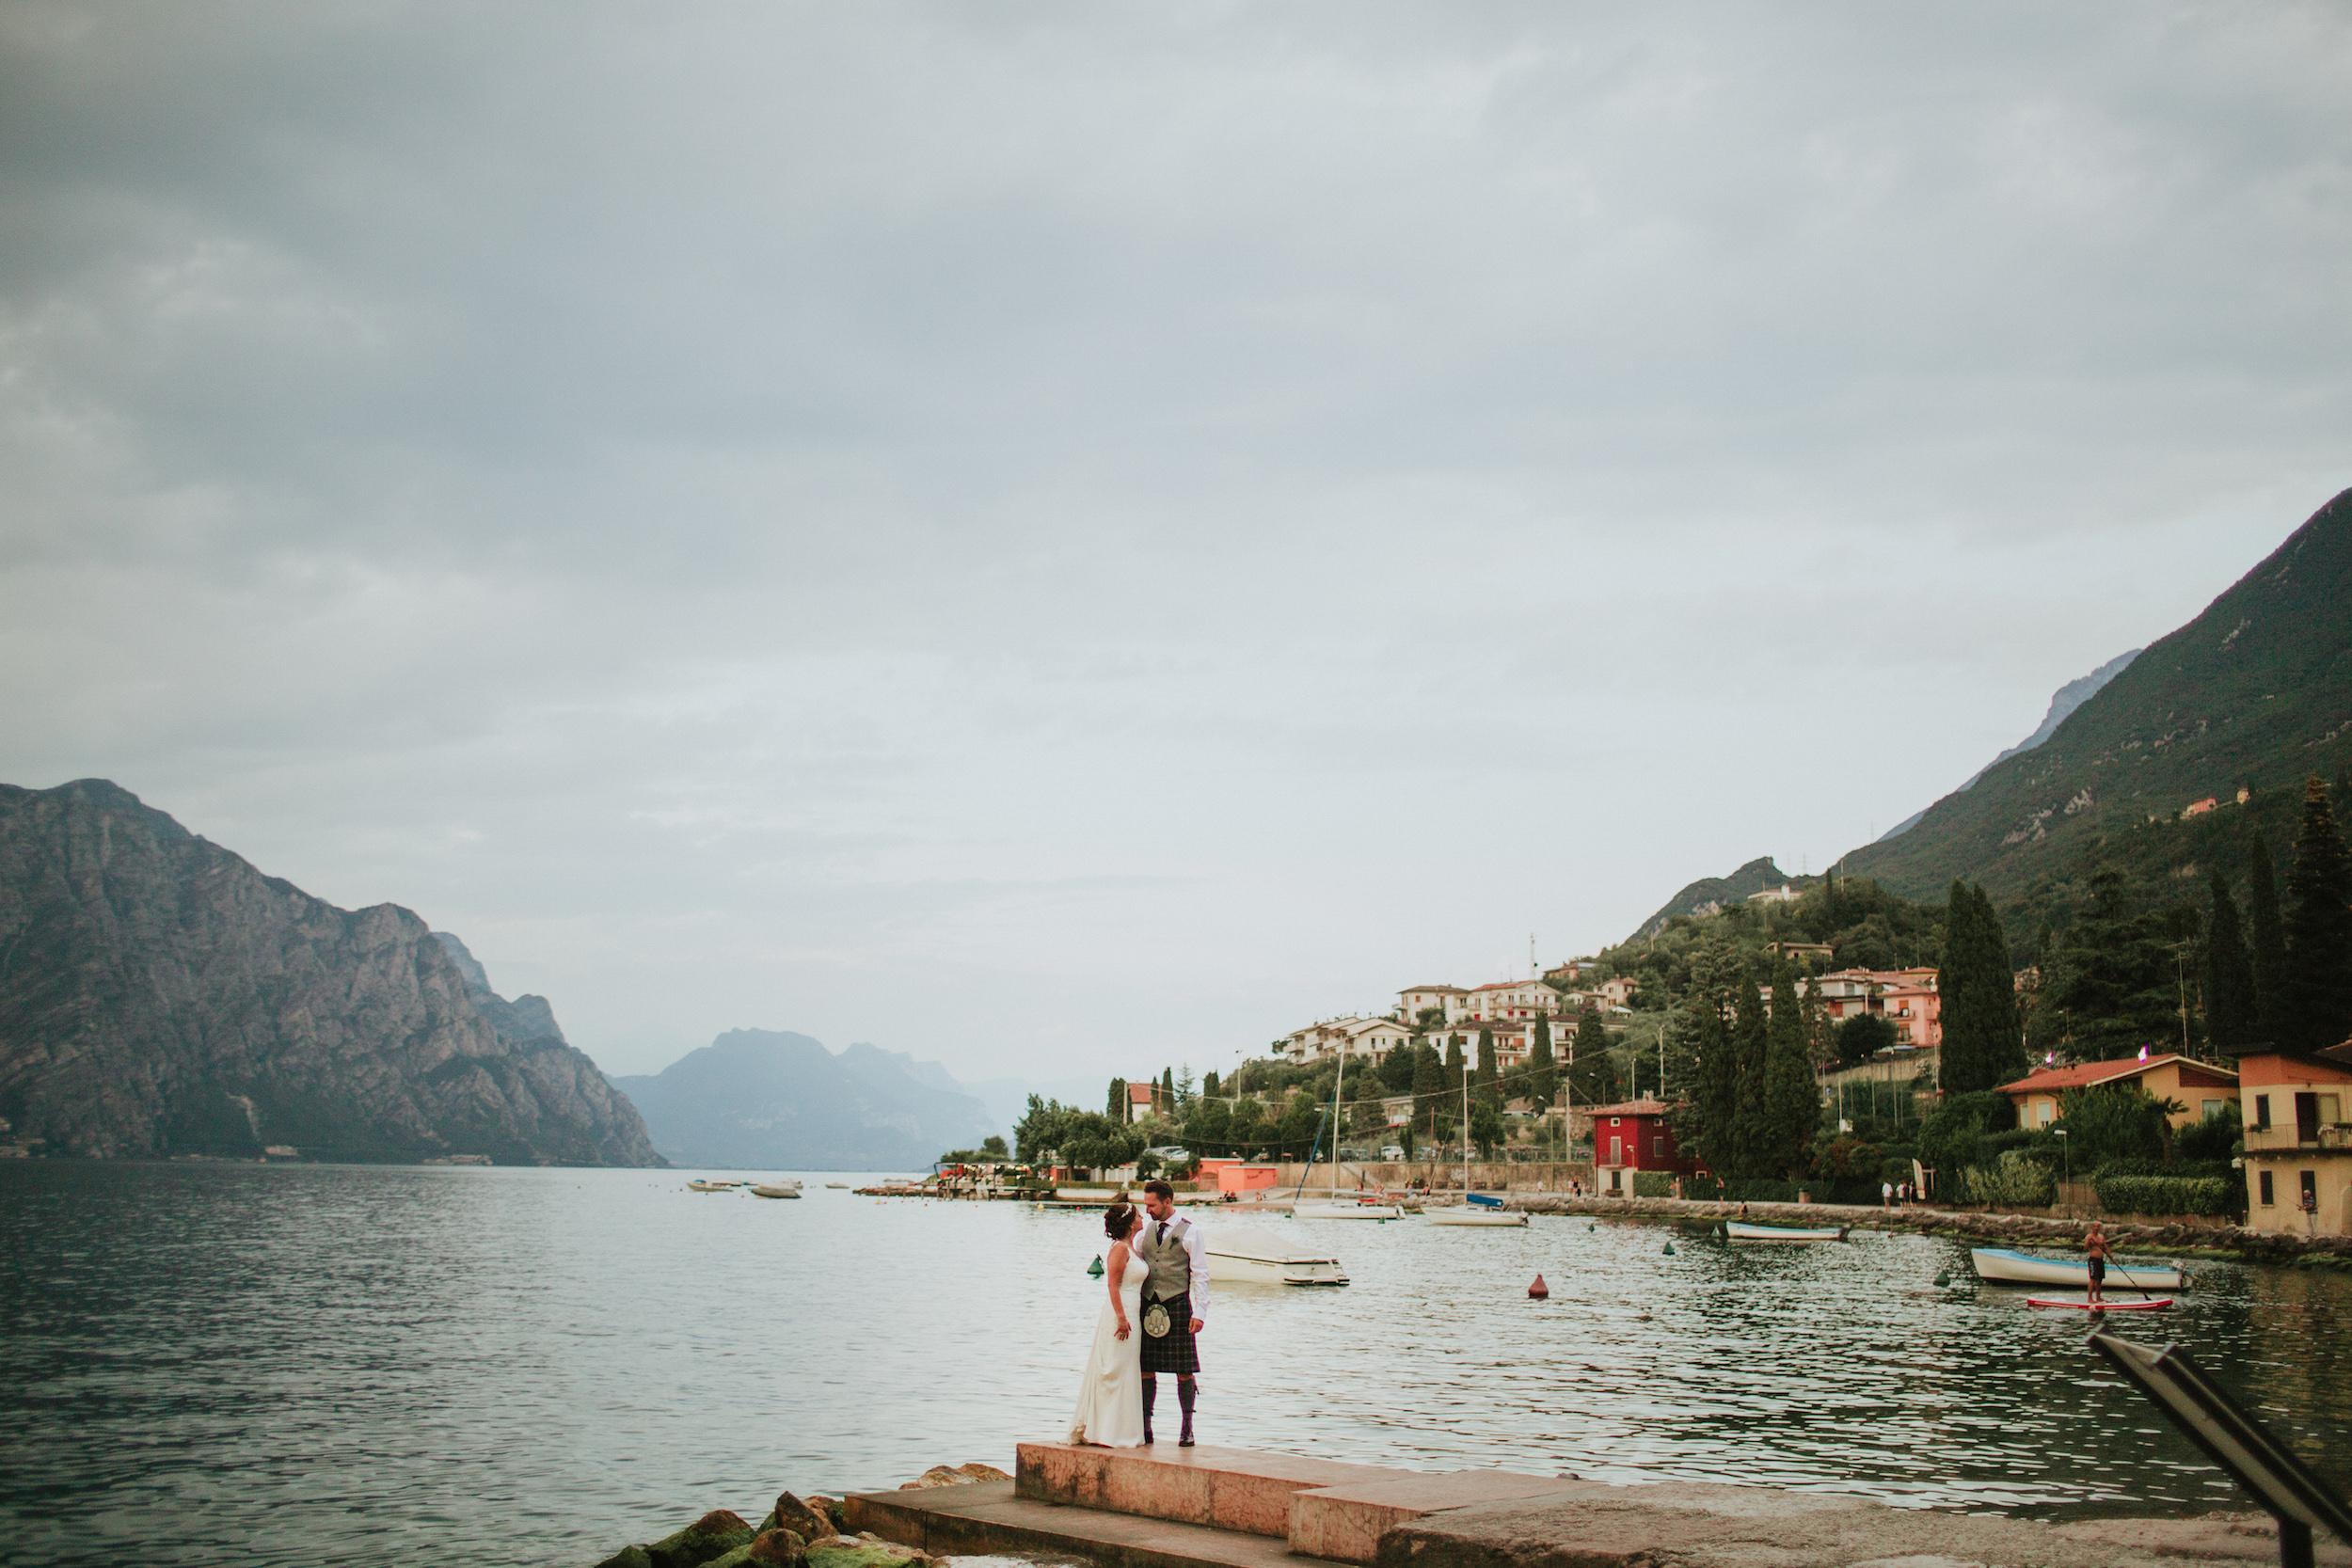 Nick + Lorraine - Malcesine, Italy